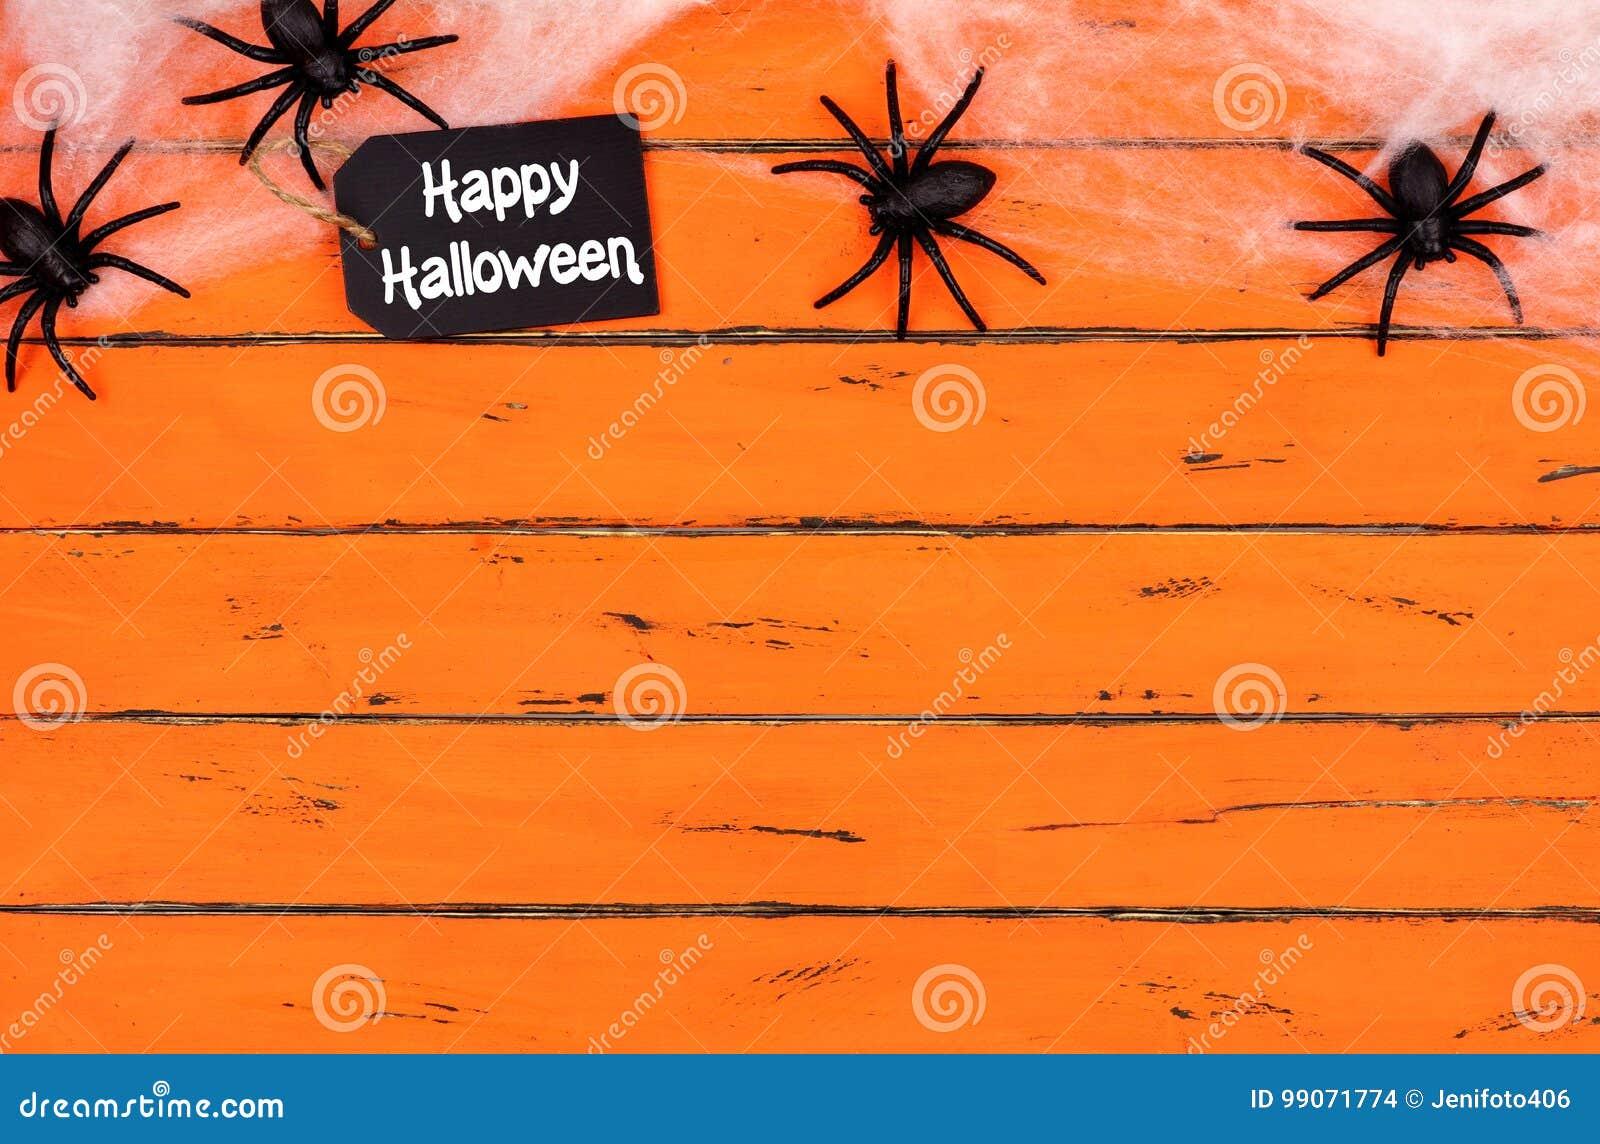 Happy Halloween tag with spider web top border on orange wood